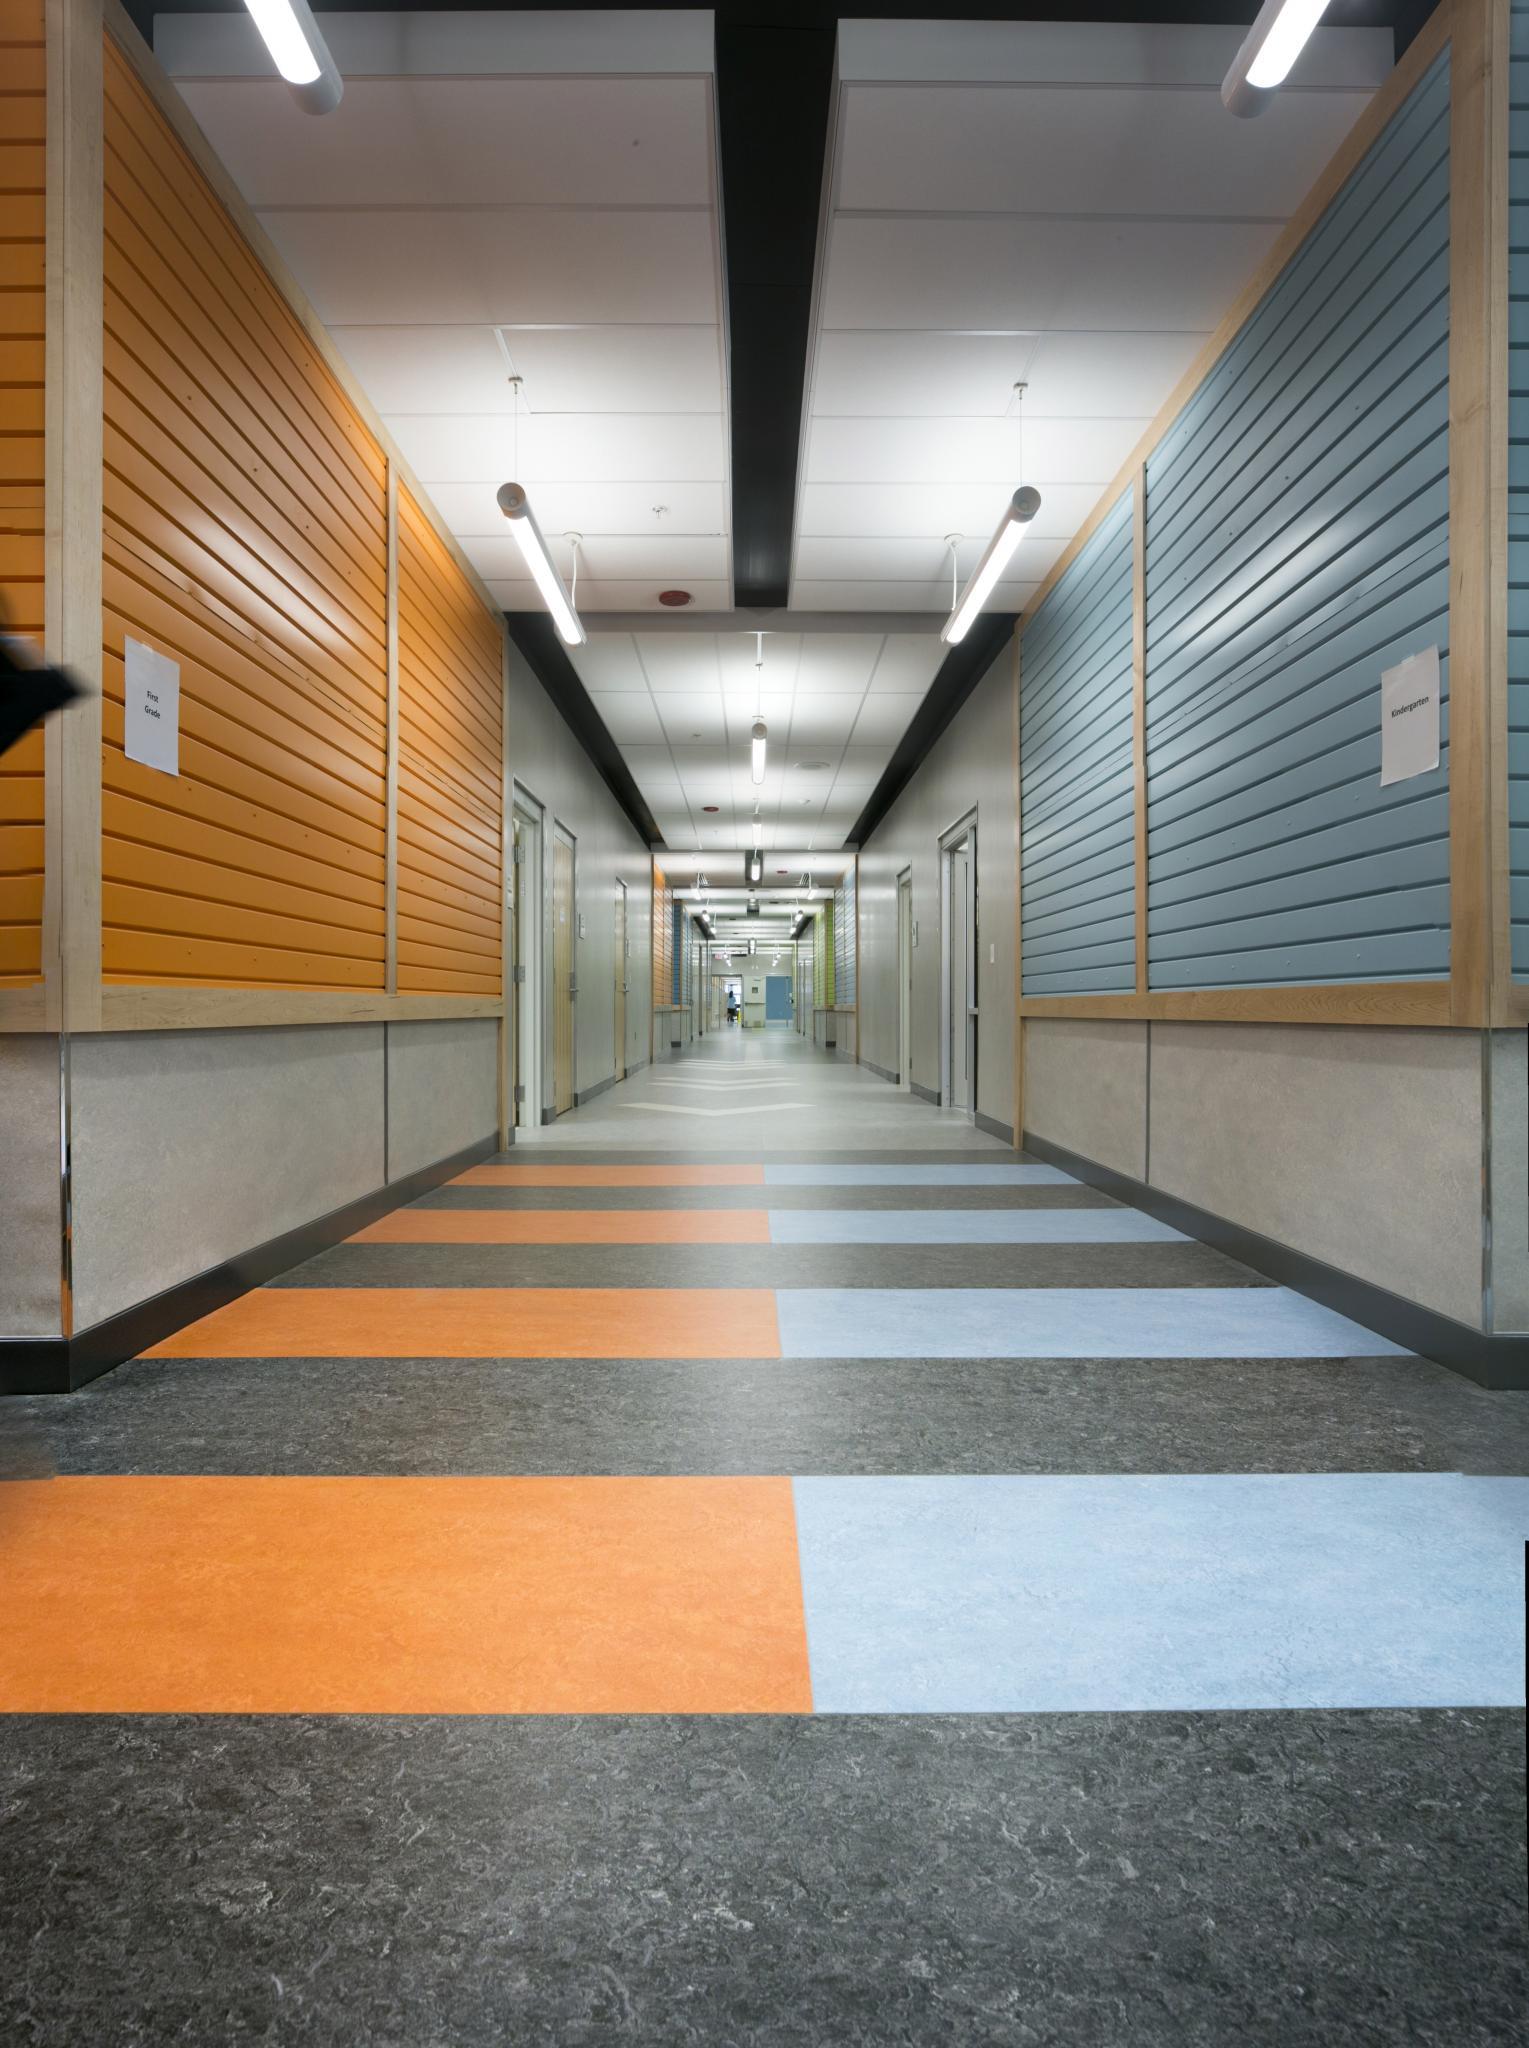 image of a hallway